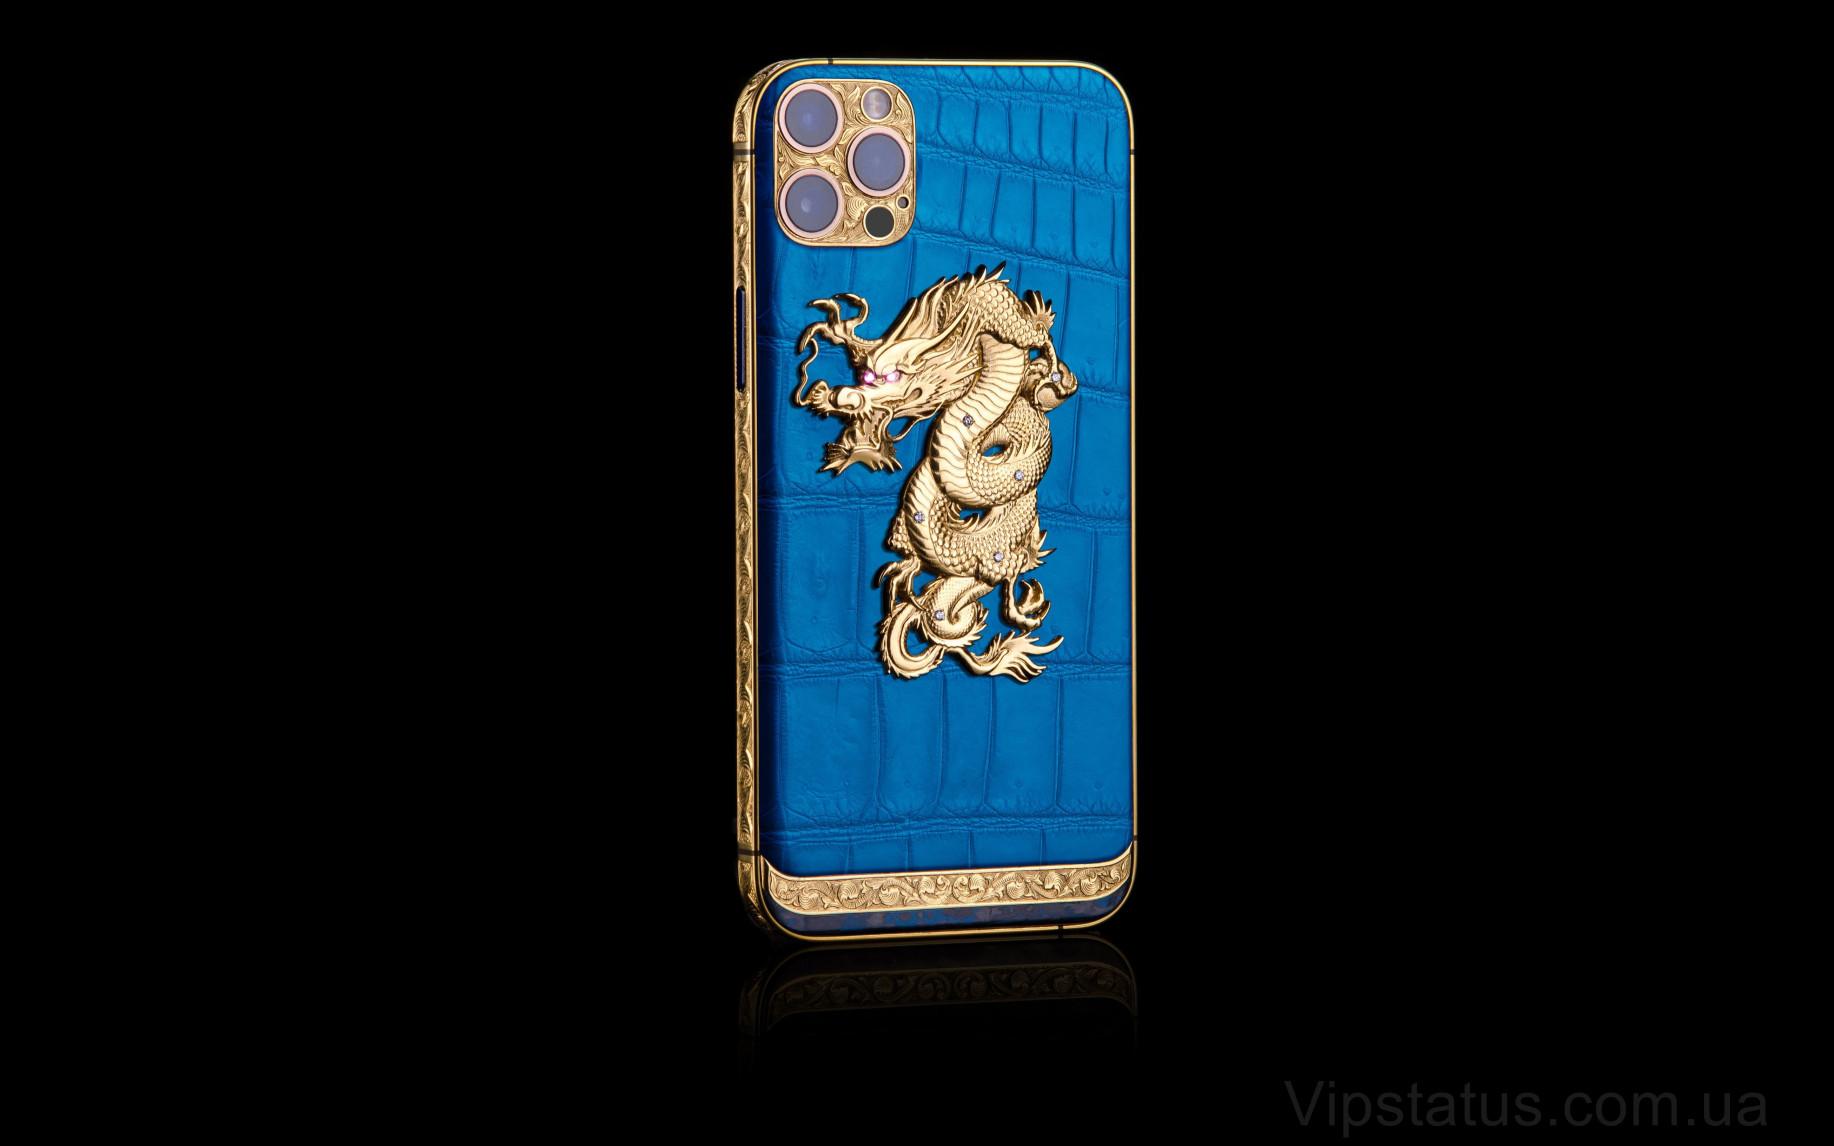 Elite Oriental Dragon IPHONE 12 PRO MAX 512 GB Oriental Dragon IPHONE 12 PRO MAX 512 GB image 7